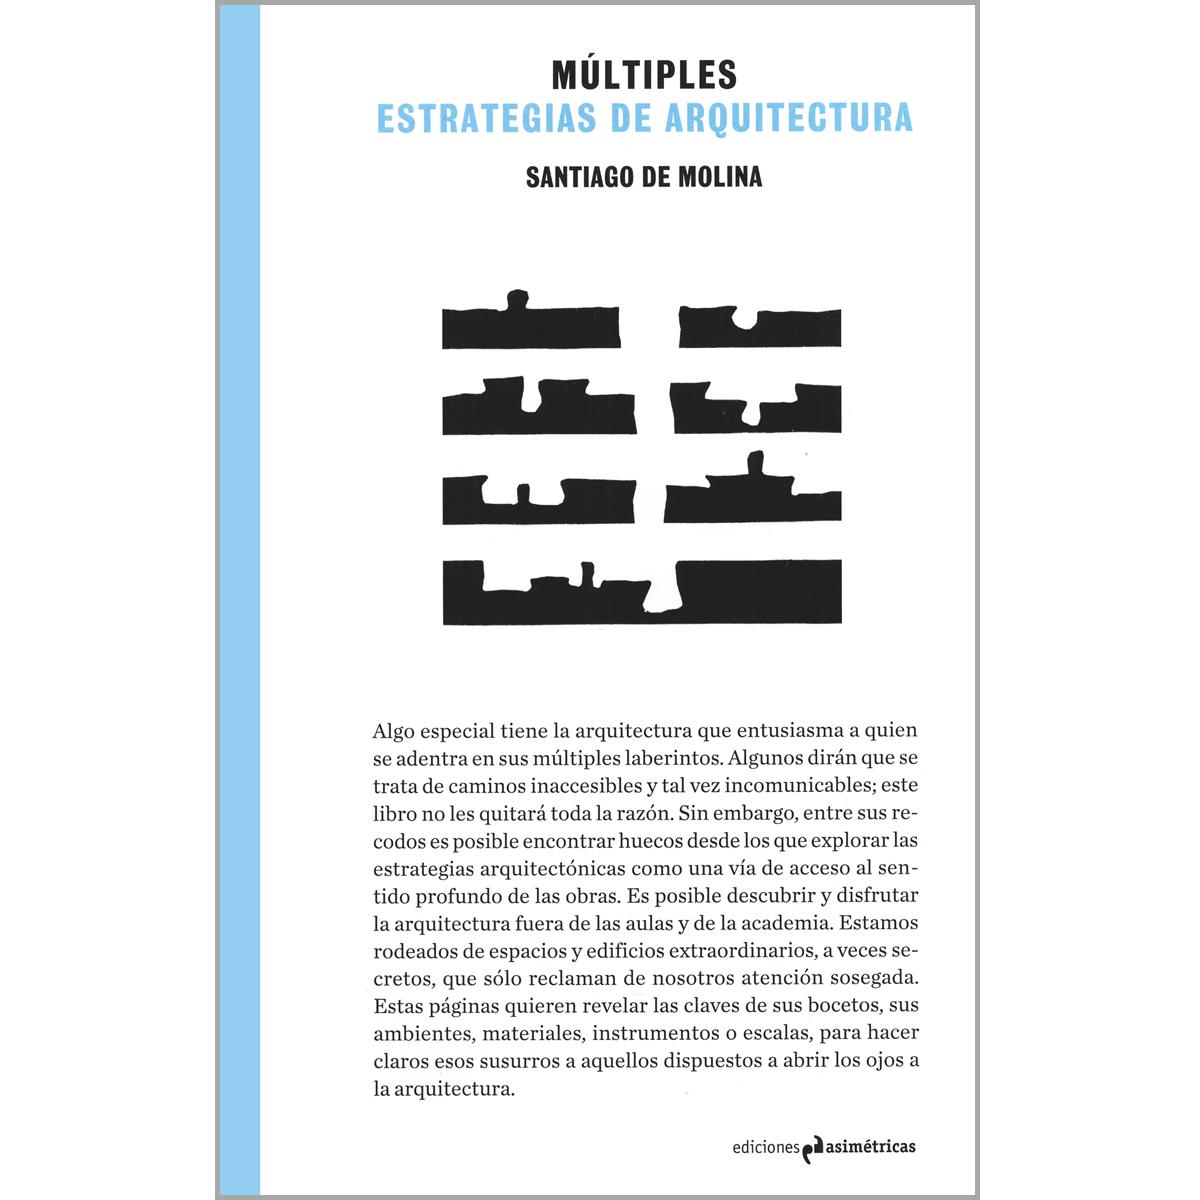 Múltiples estrategias de arquitectura